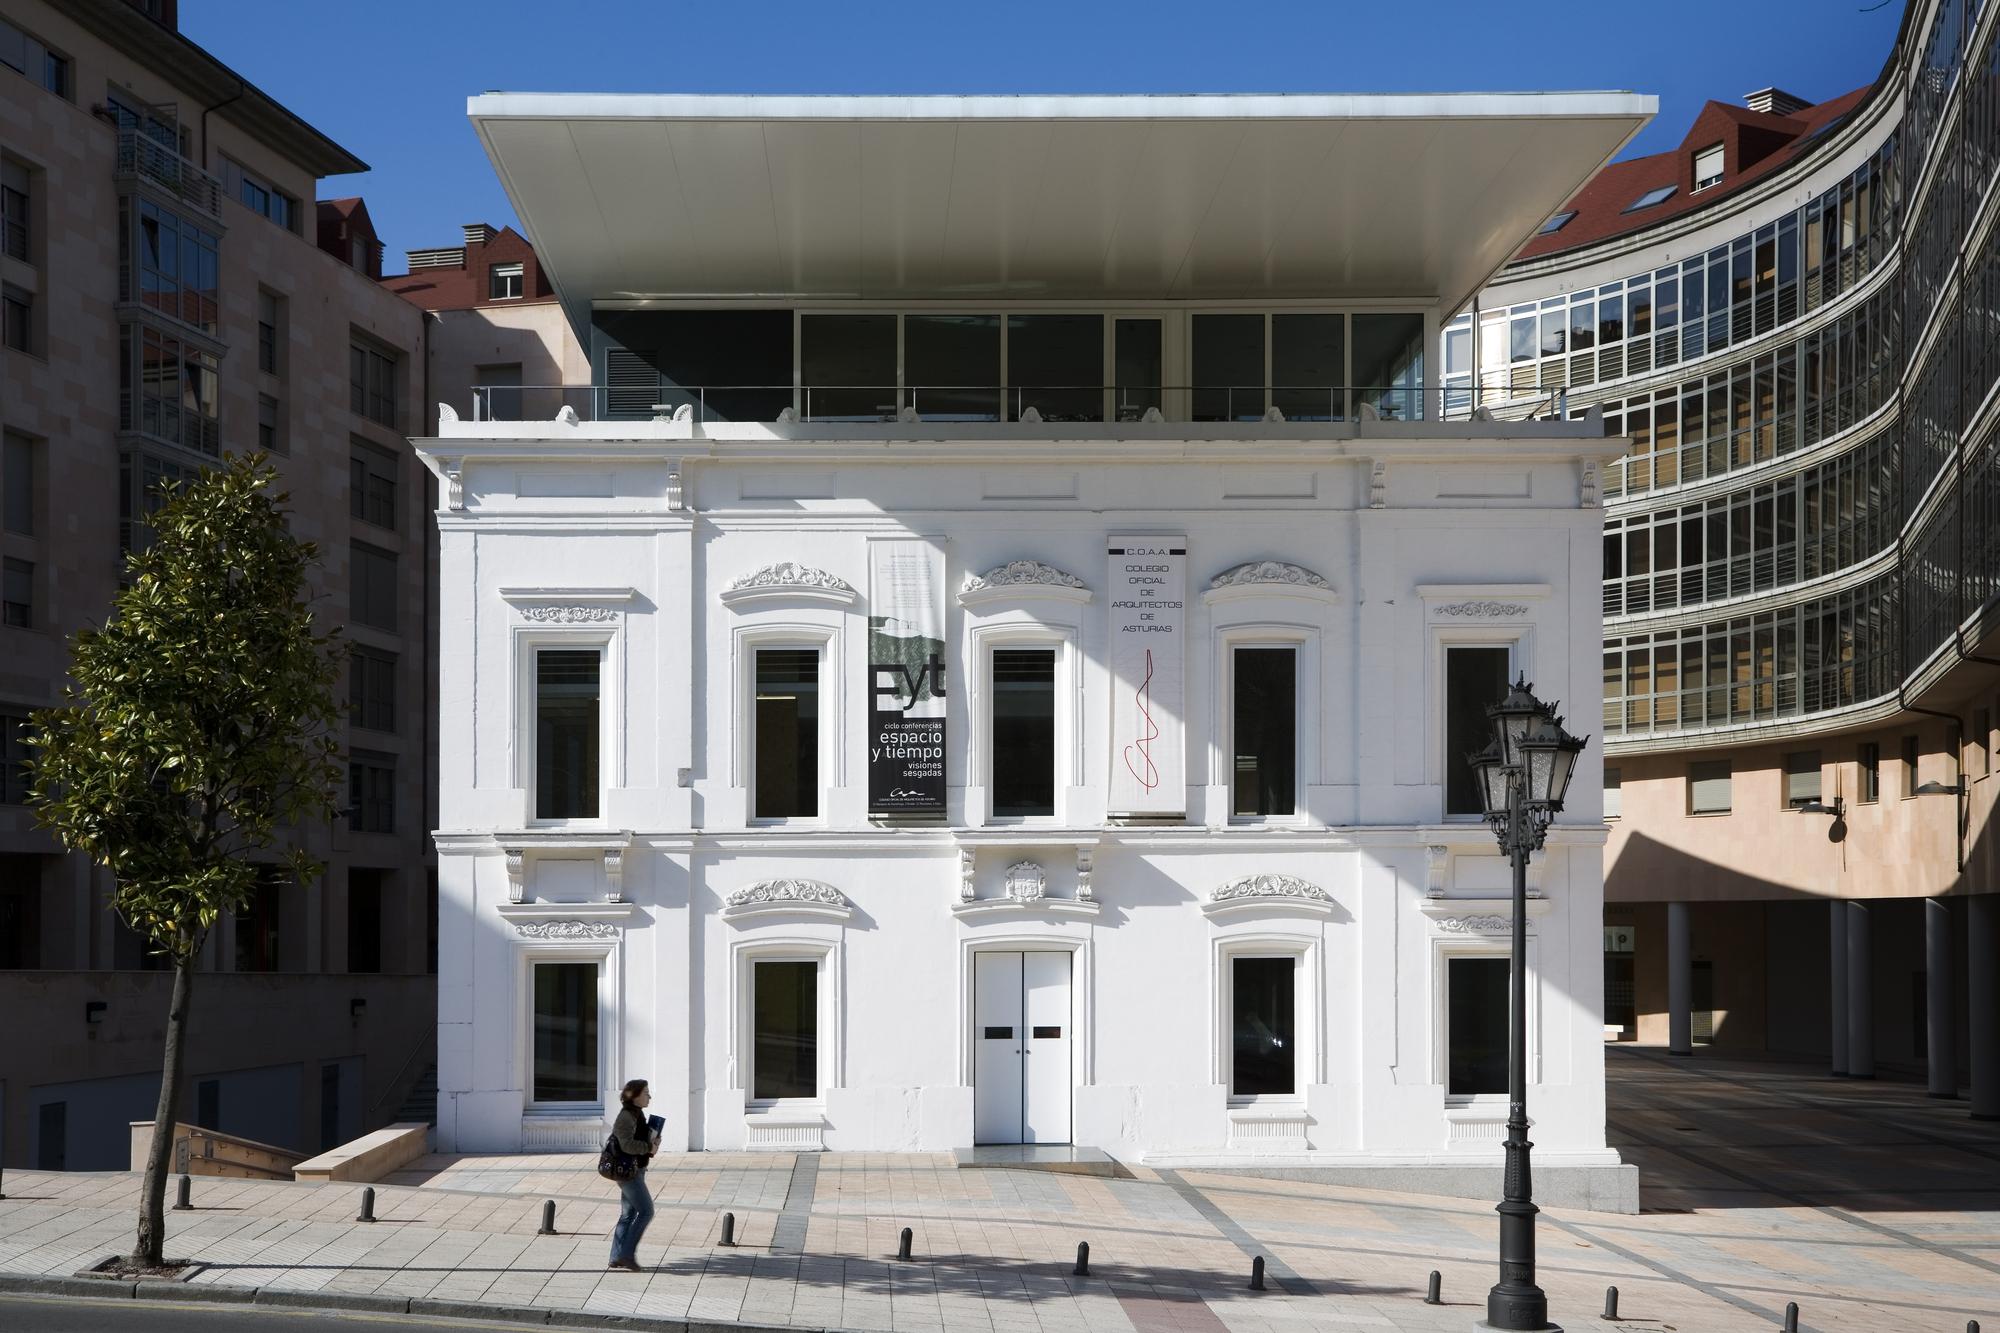 5099449328ba0d03f00001da sede del colego oficial de - Arquitectos asturias ...